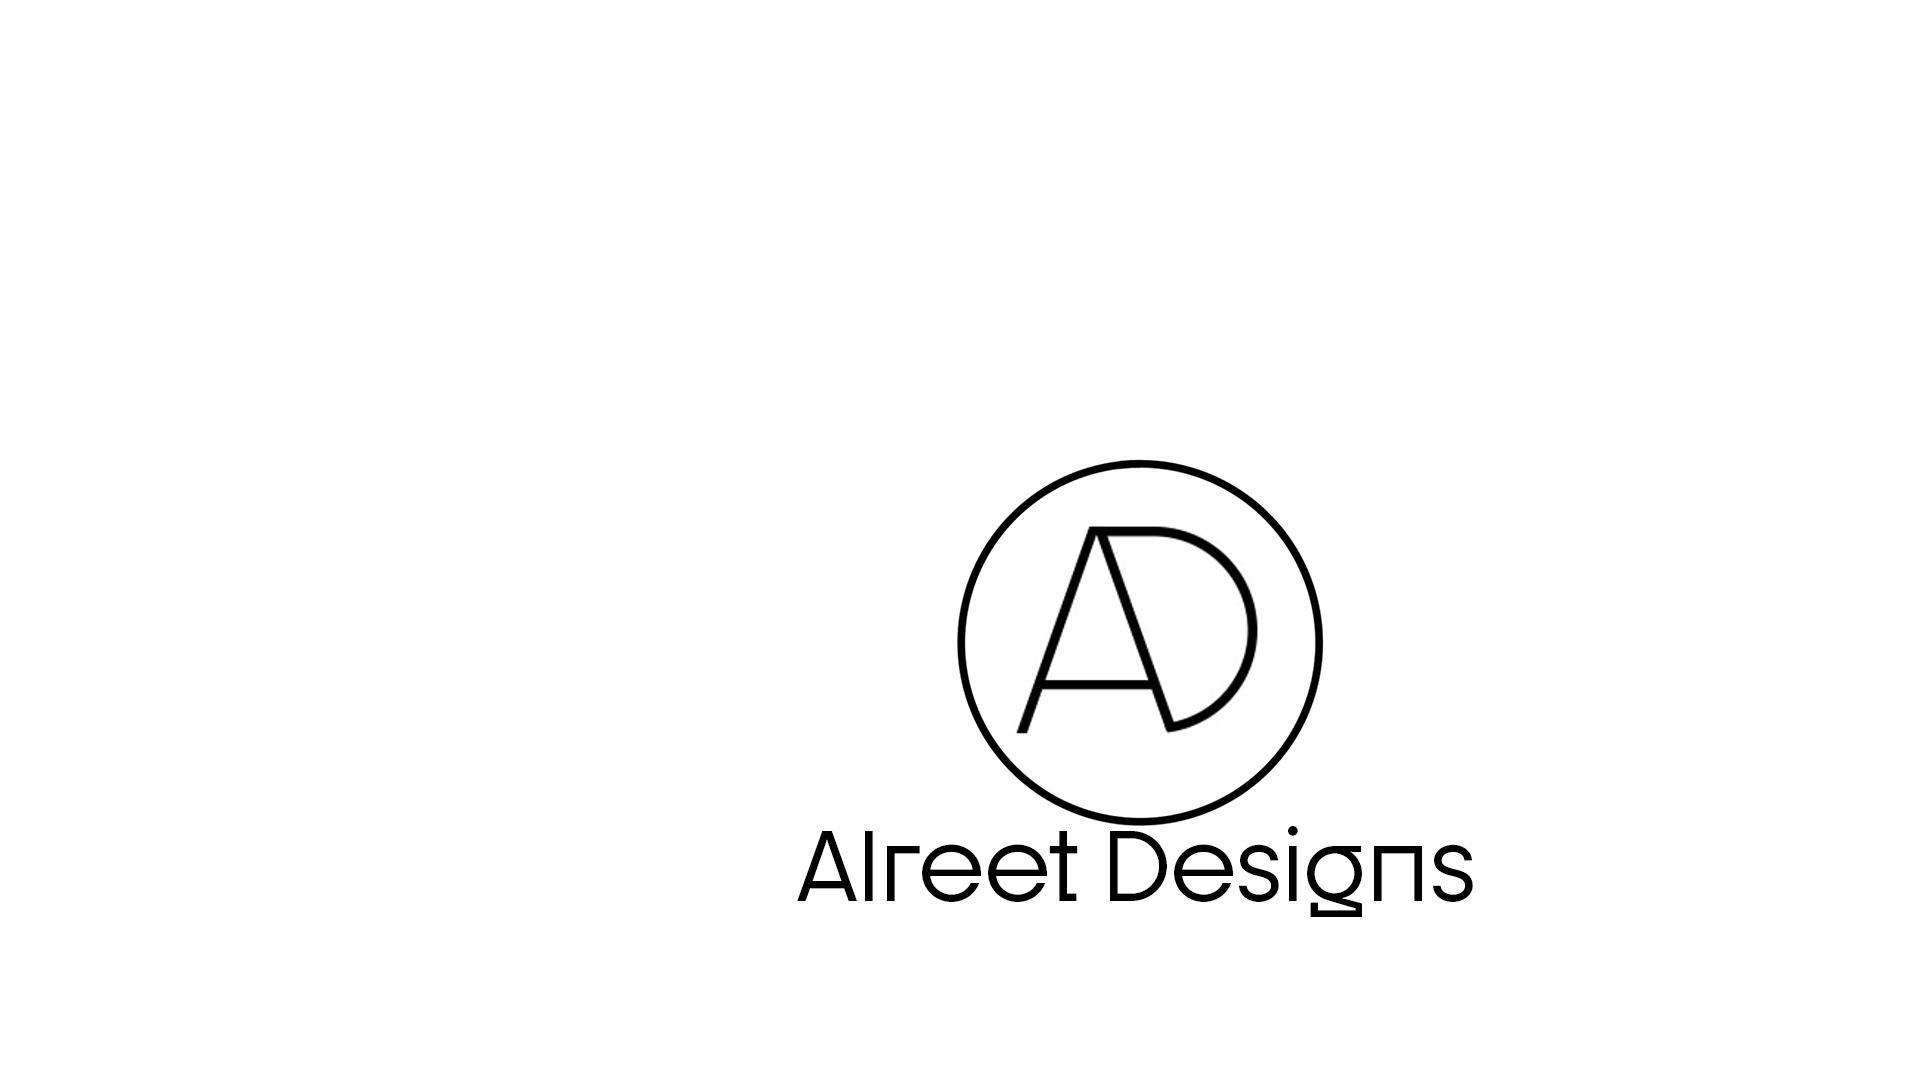 Alreet Designs logo